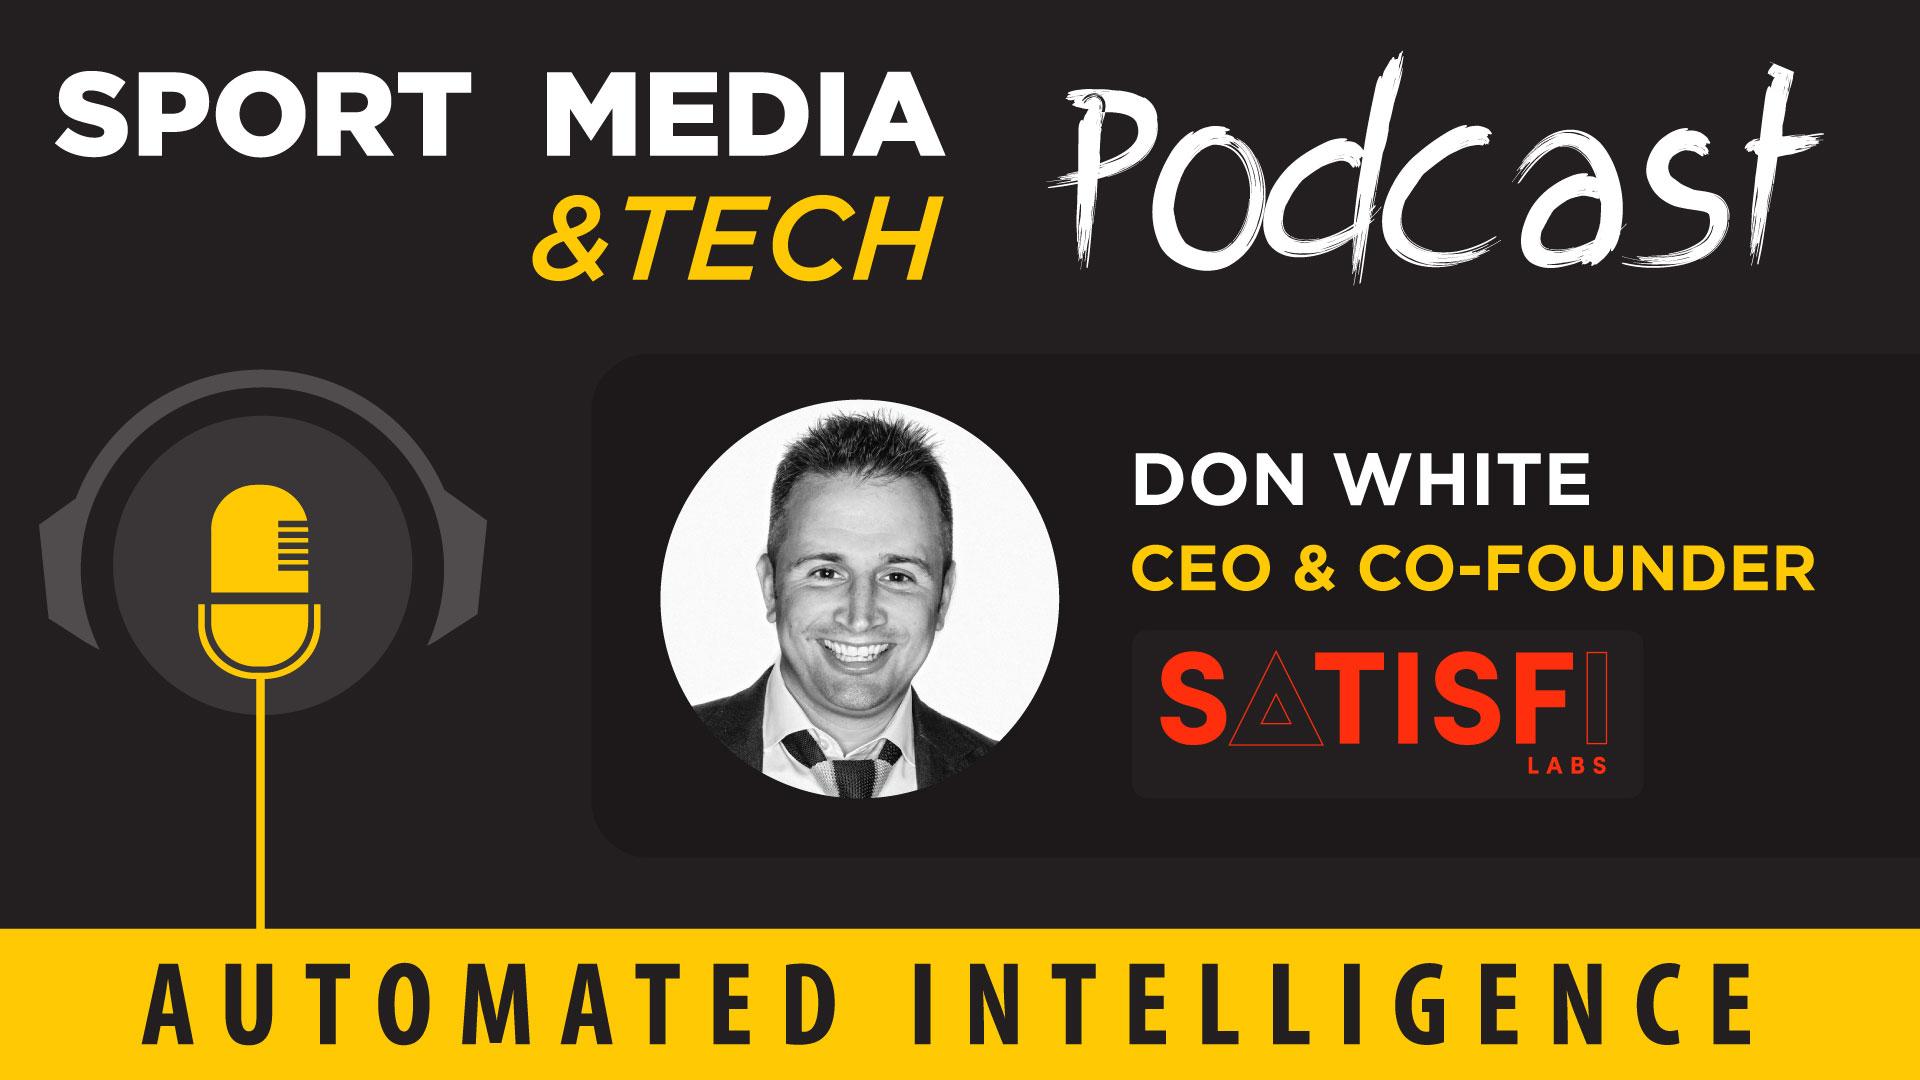 Episode 23: Automated Intelligence & Satisfi Labs